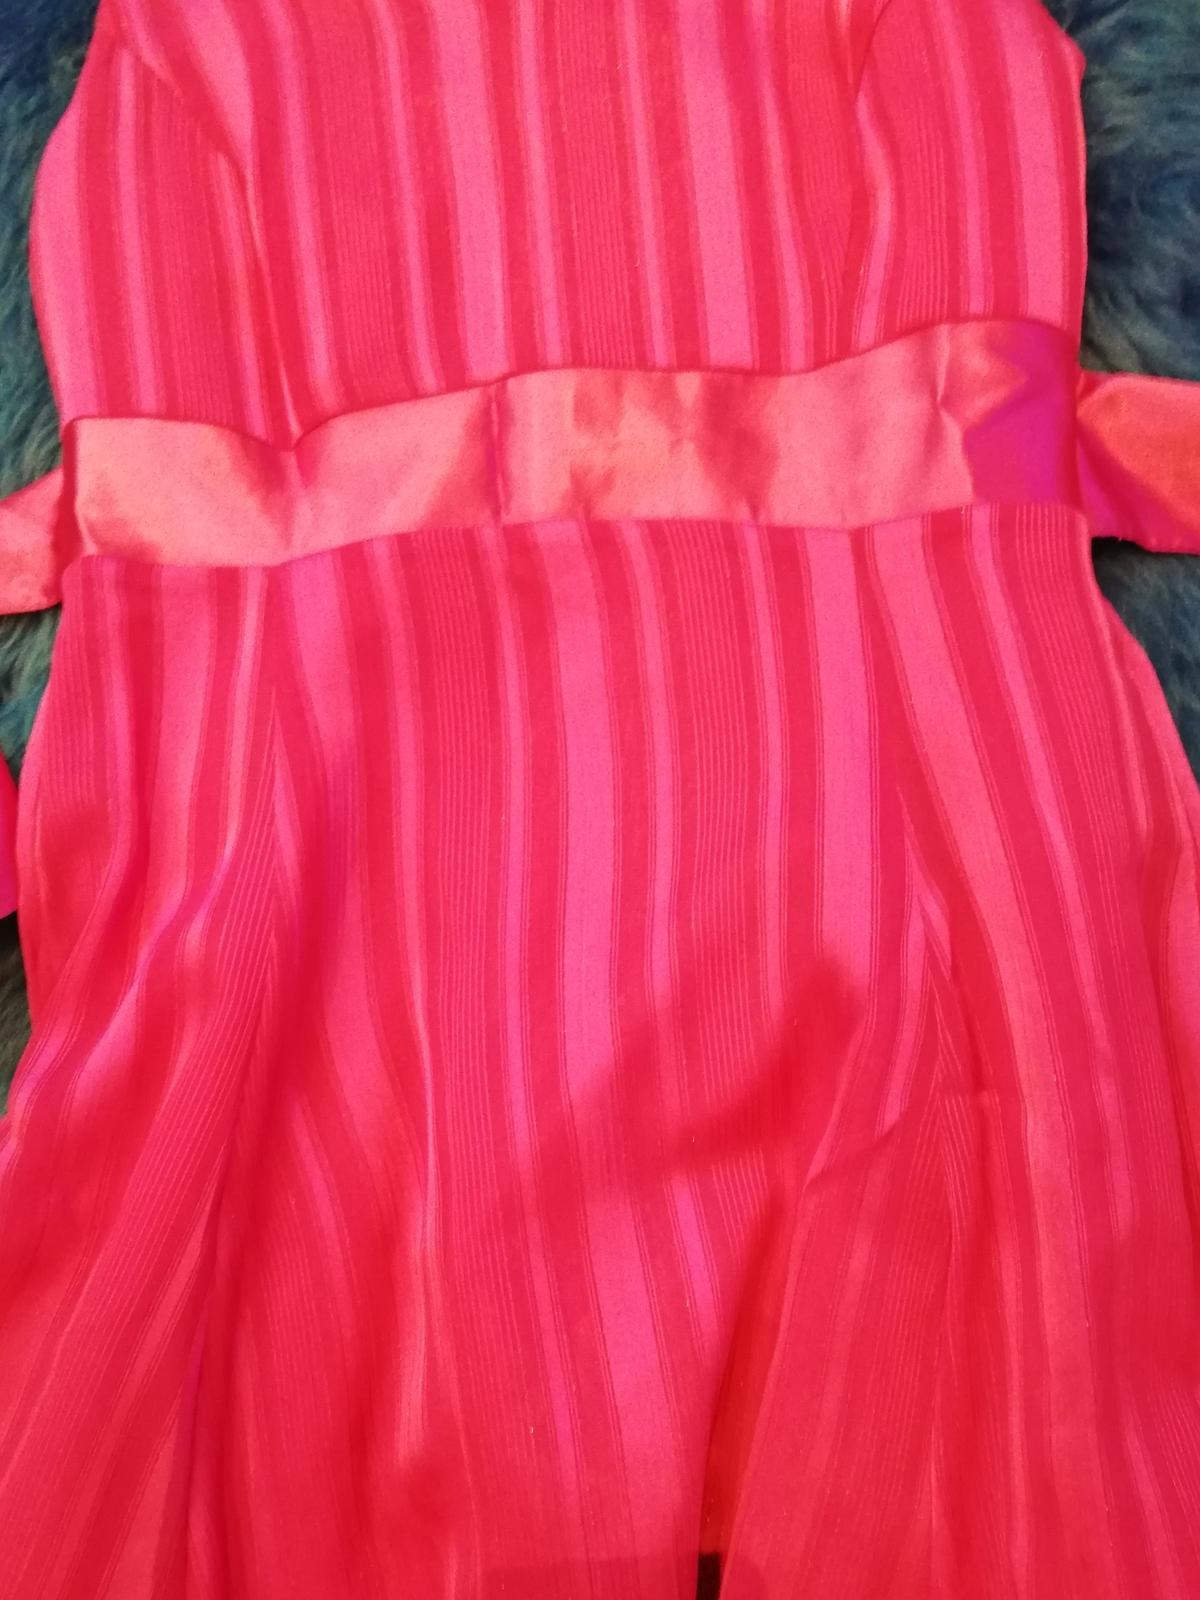 Cyklaménové šaty  - Obrázok č. 2